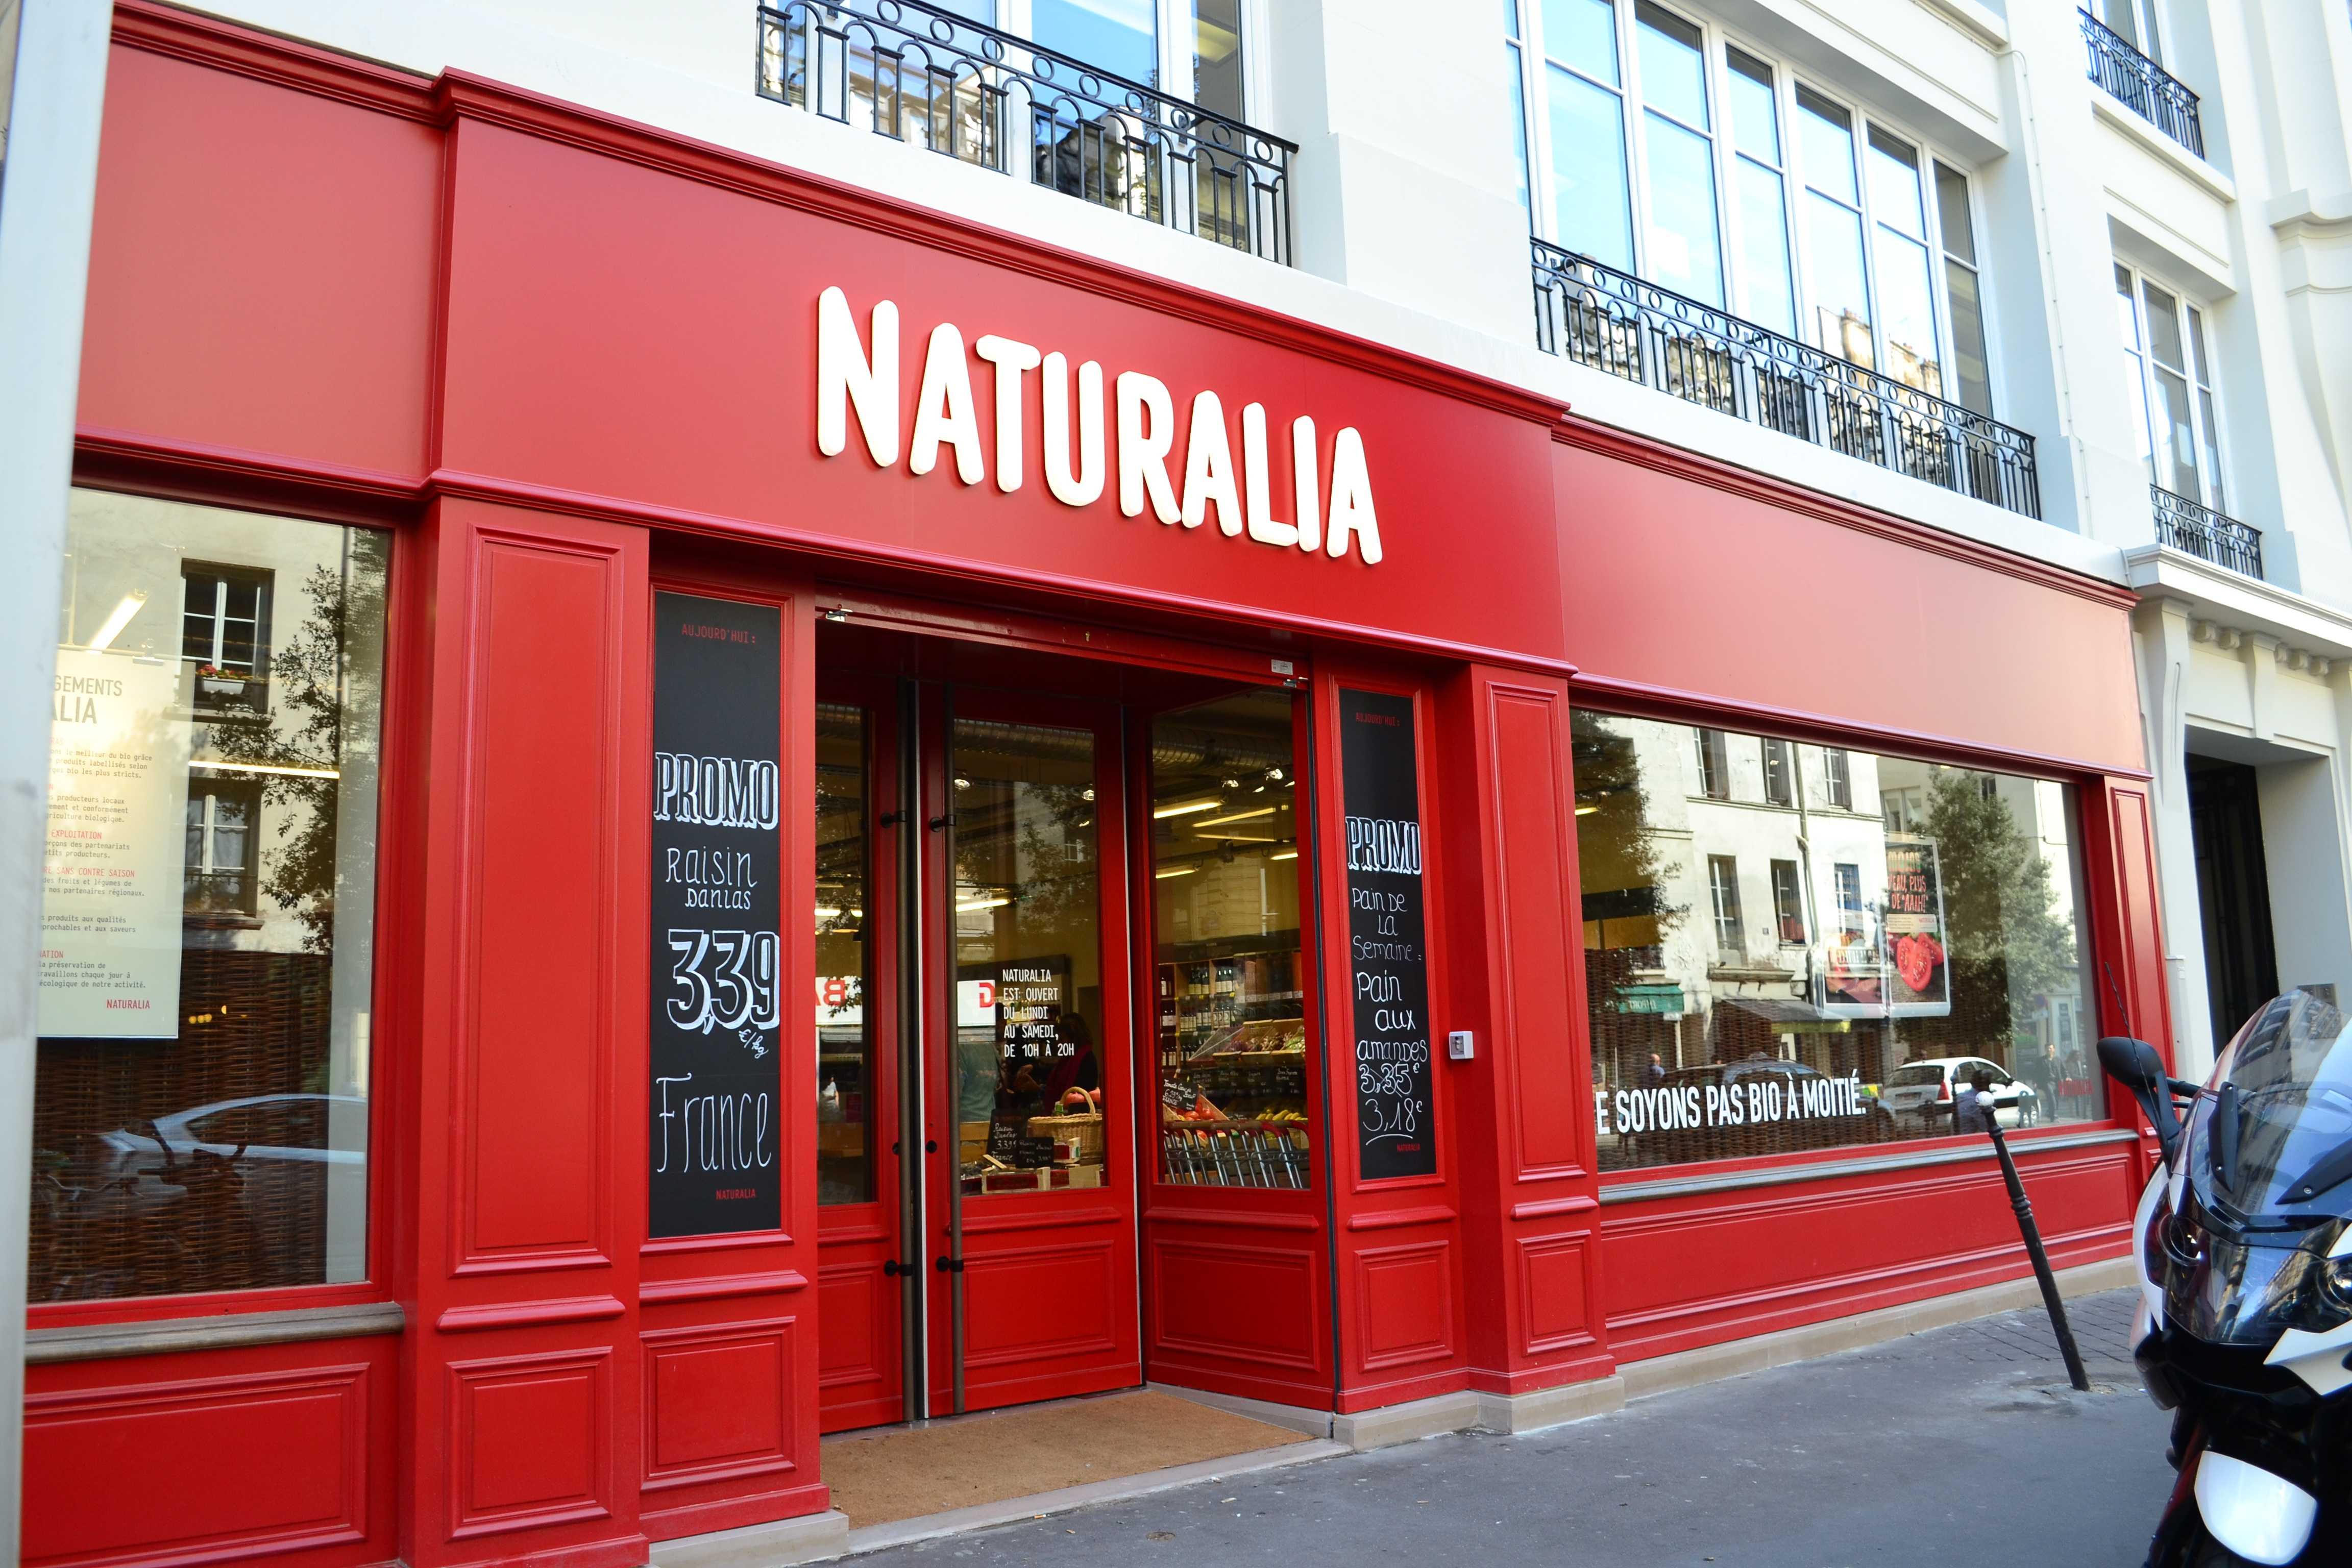 「naturalia france」の画像検索結果